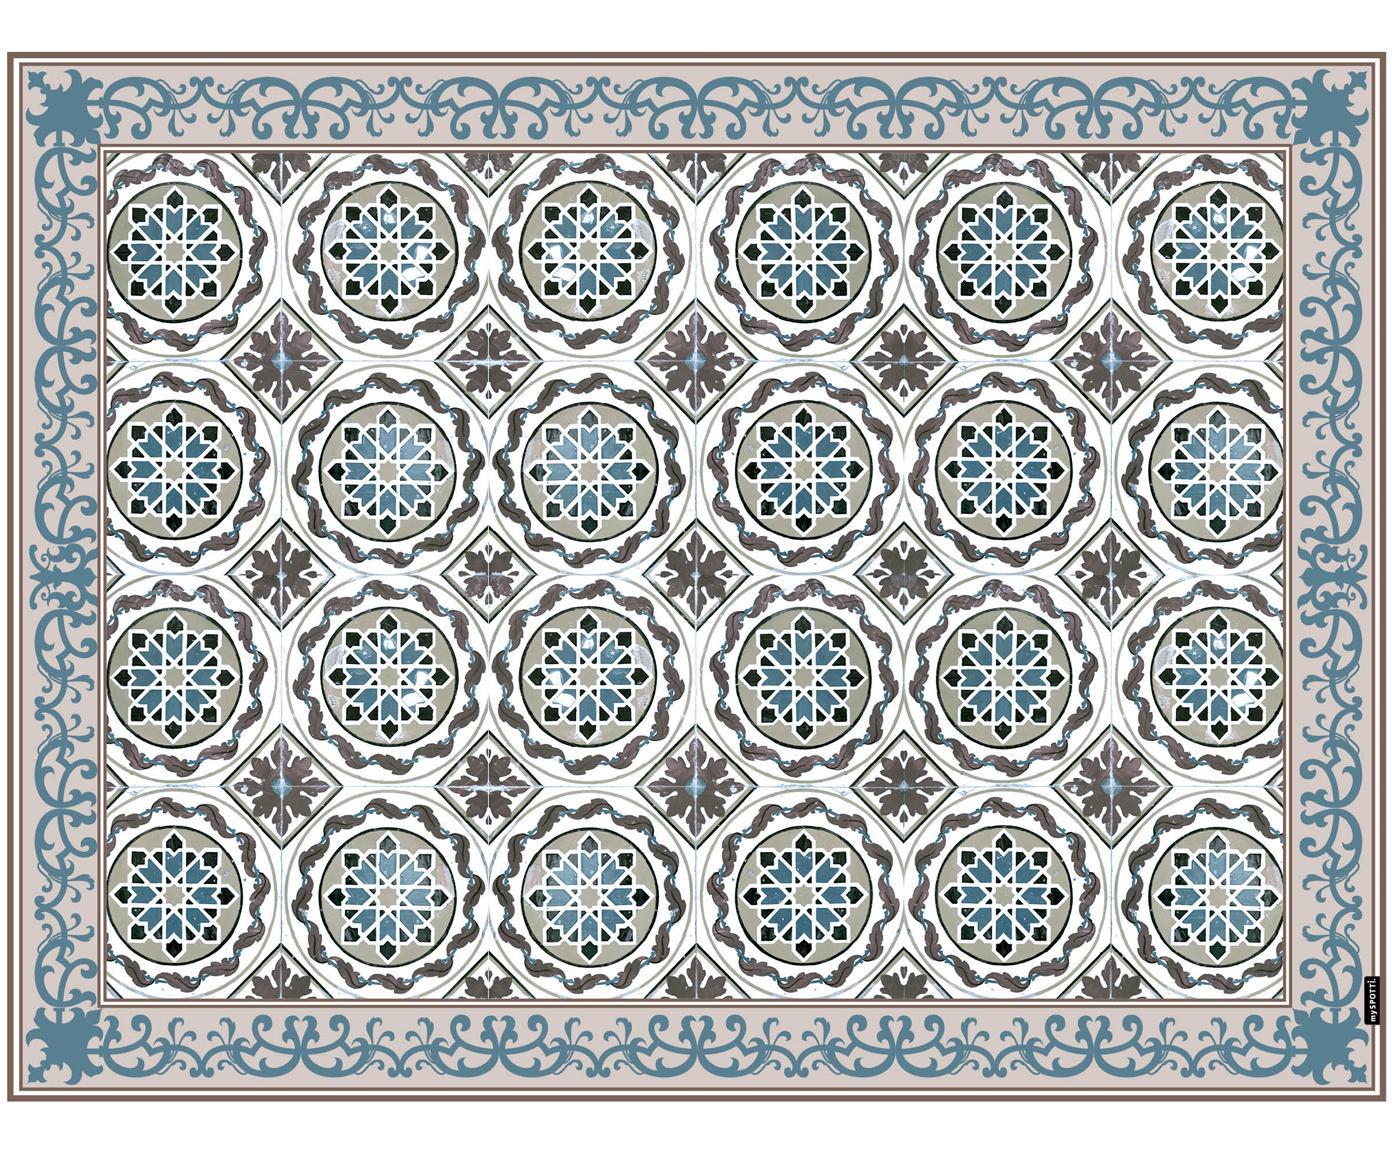 Vinyl-Bodenmatte Selina, Vinyl, recycelbar, Beige, Braun, Blau, 65 x 85 cm